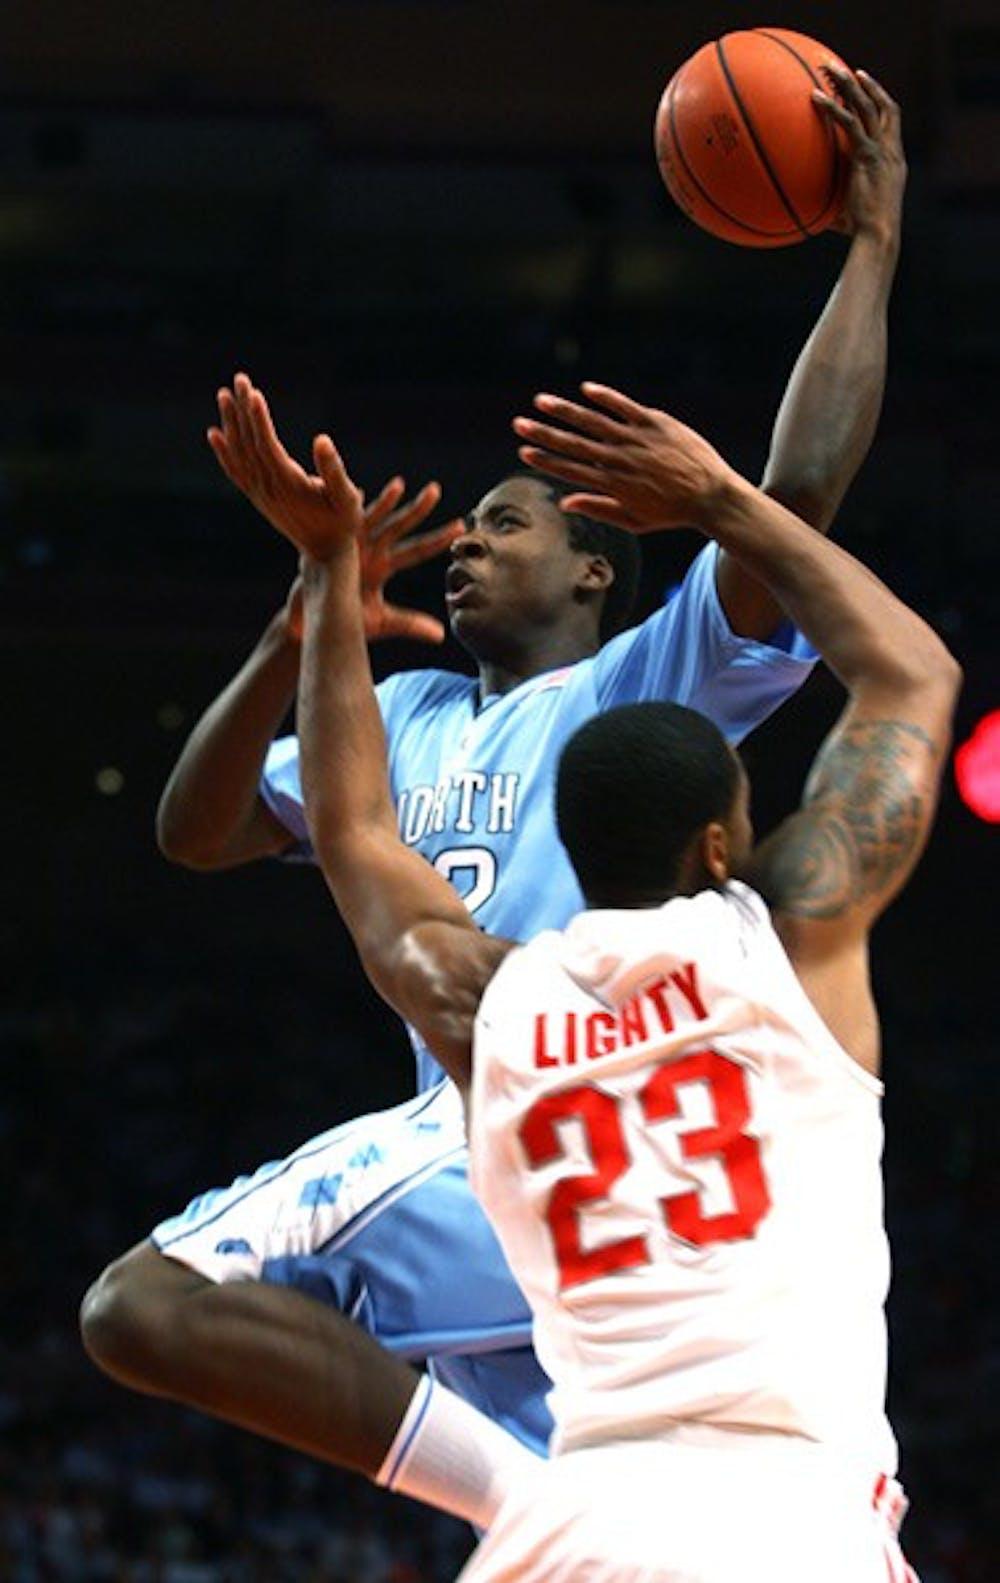 UNC's Ed Davis goes for a shot against Ohio State's David Lighty. DTH/Andrew Johnson